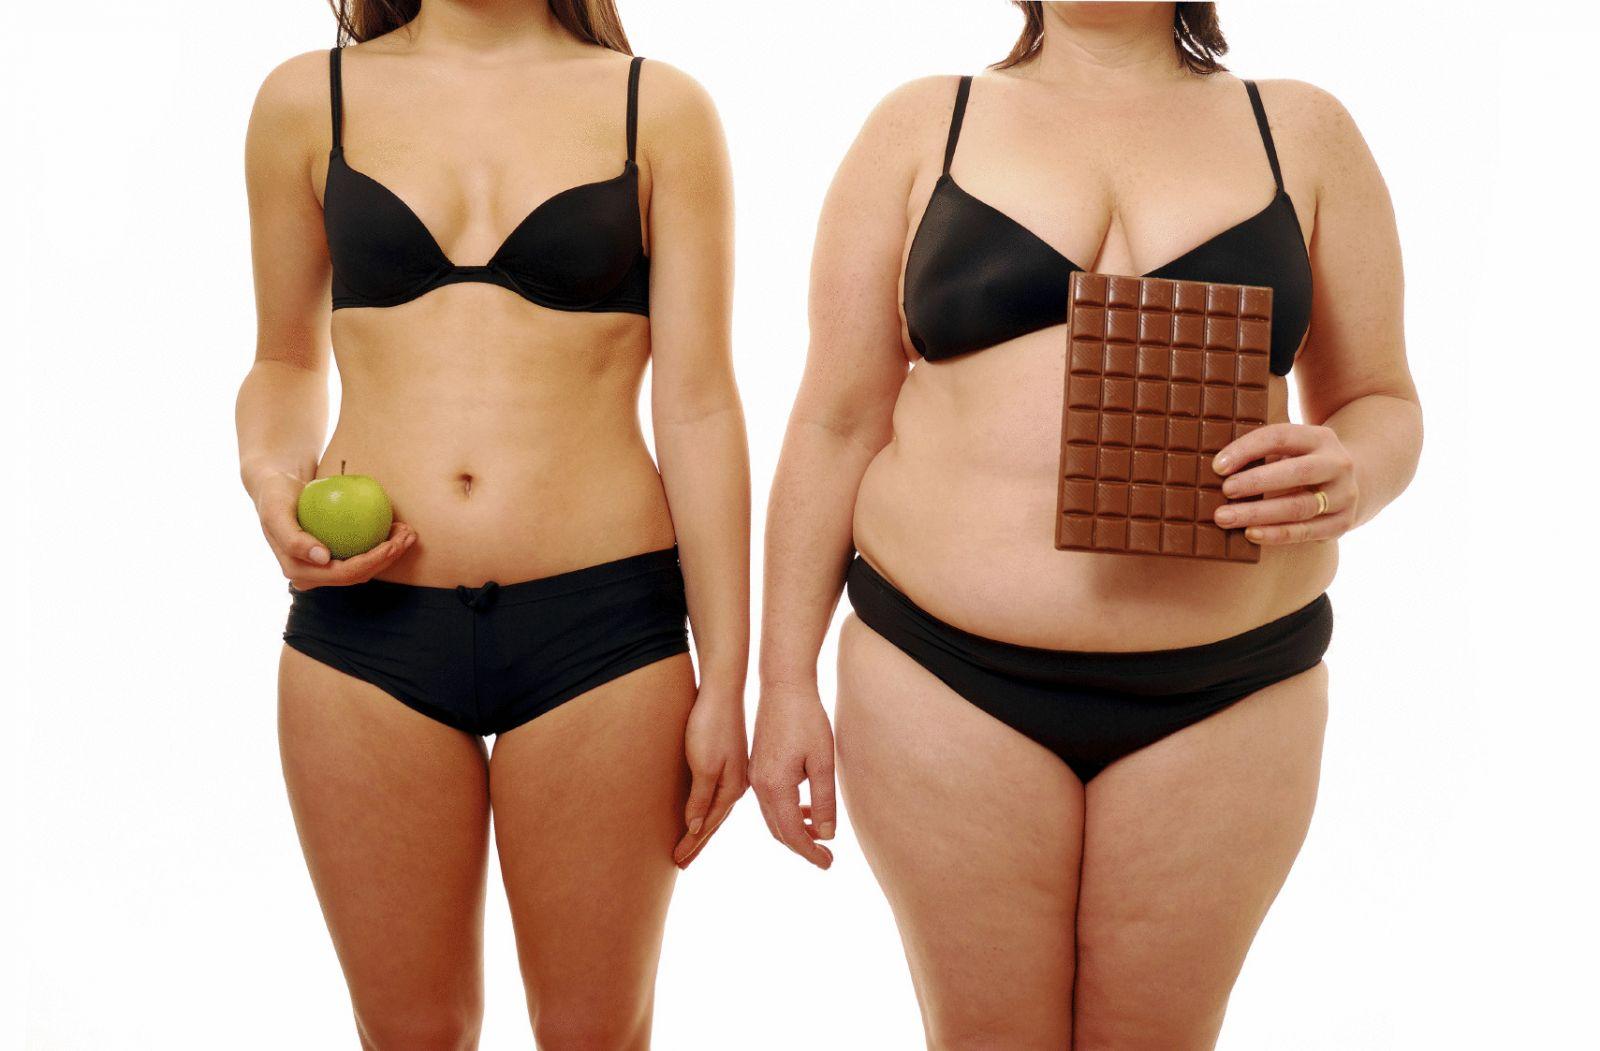 как похудеть за месяц на 4 килограмма